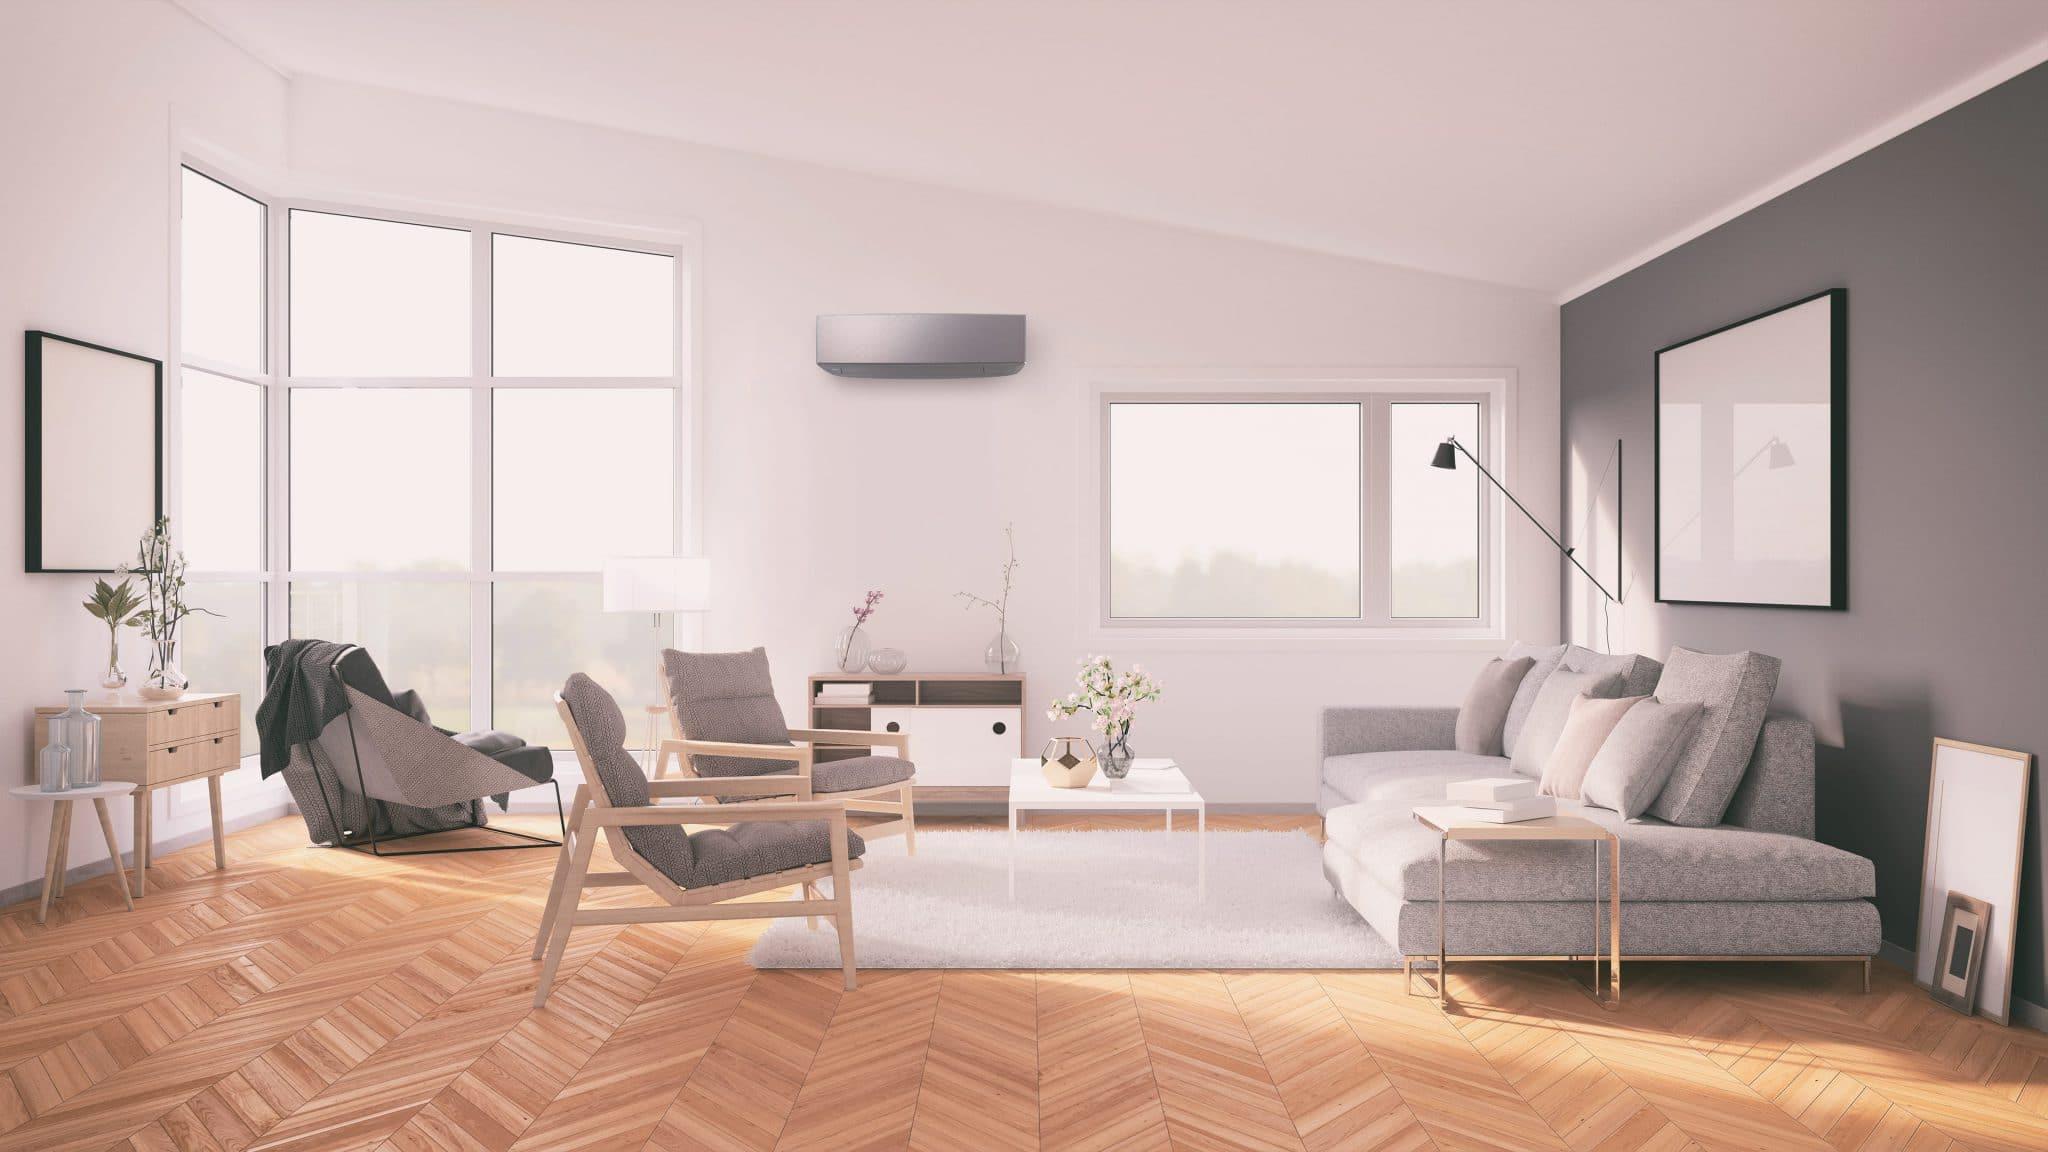 Green House Solutions zonnepanelen batterijopslag laadpalen airconditioning fujitsu 000006